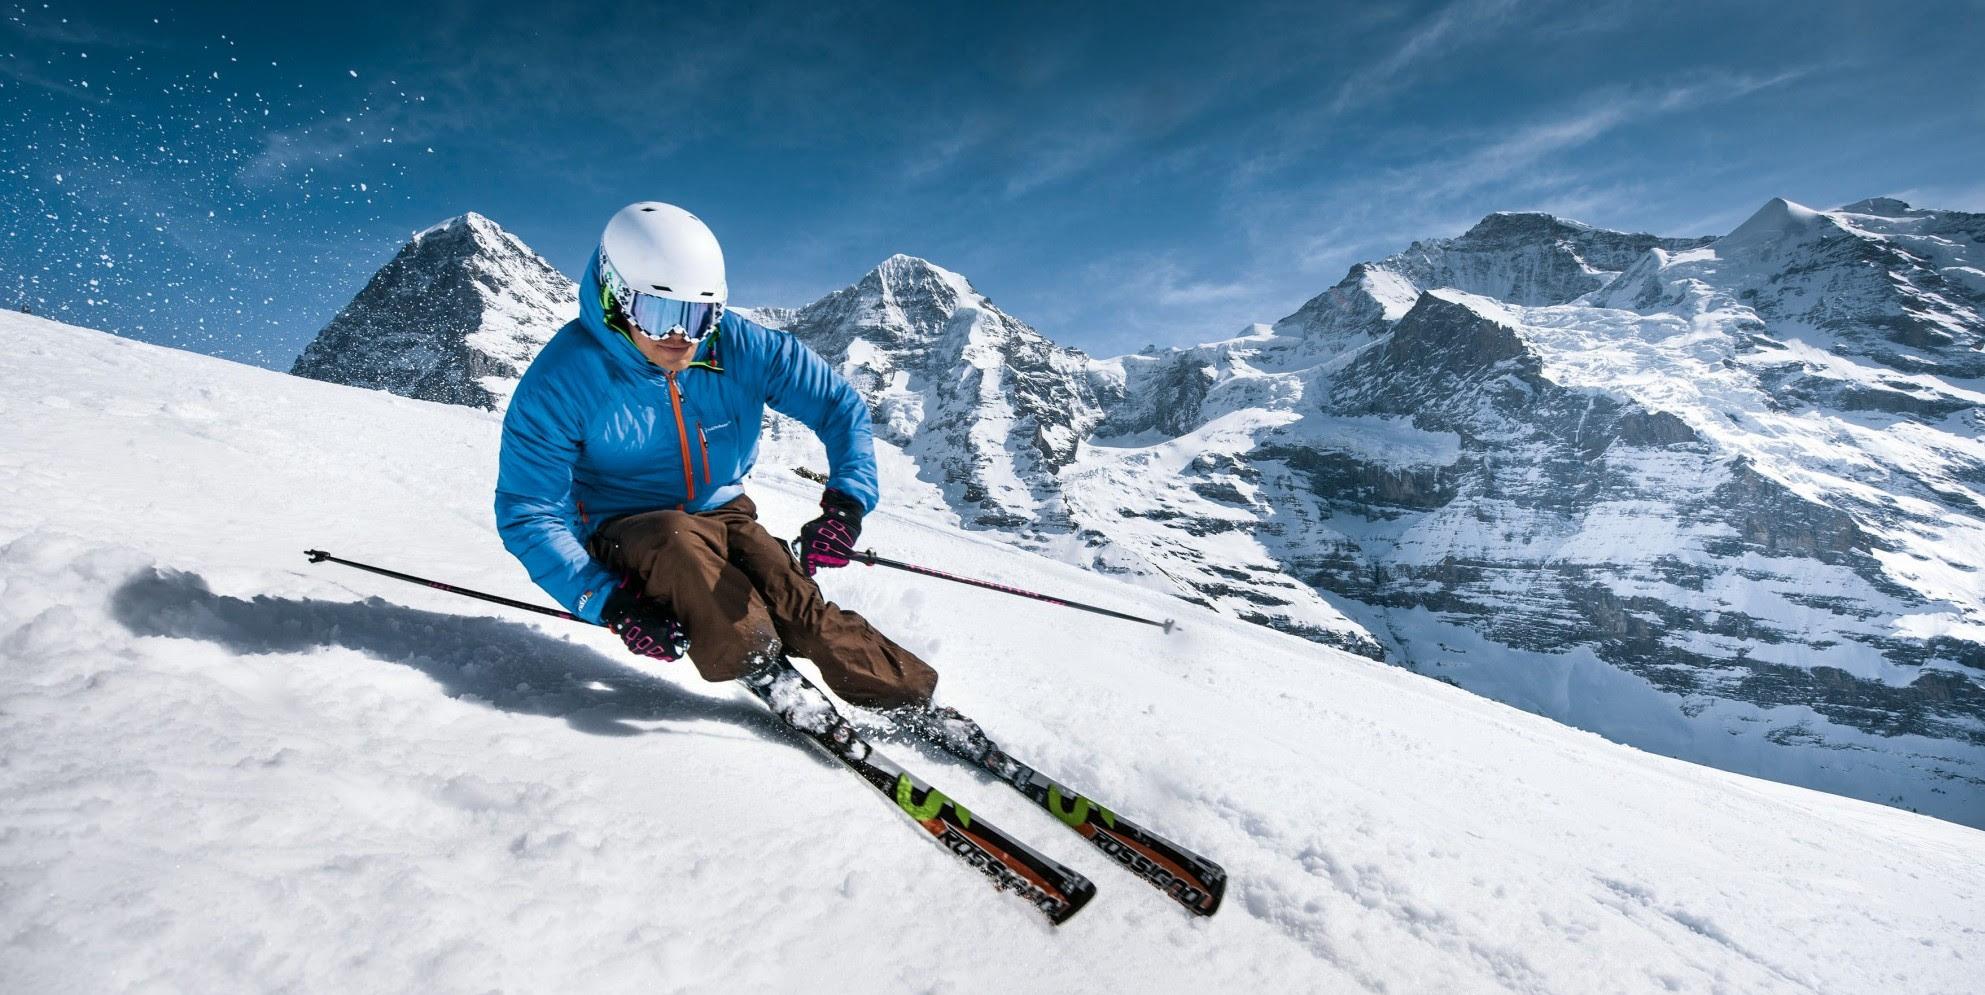 Singles Travel: Singles Ski Trip Vacations - Eriks Adventures